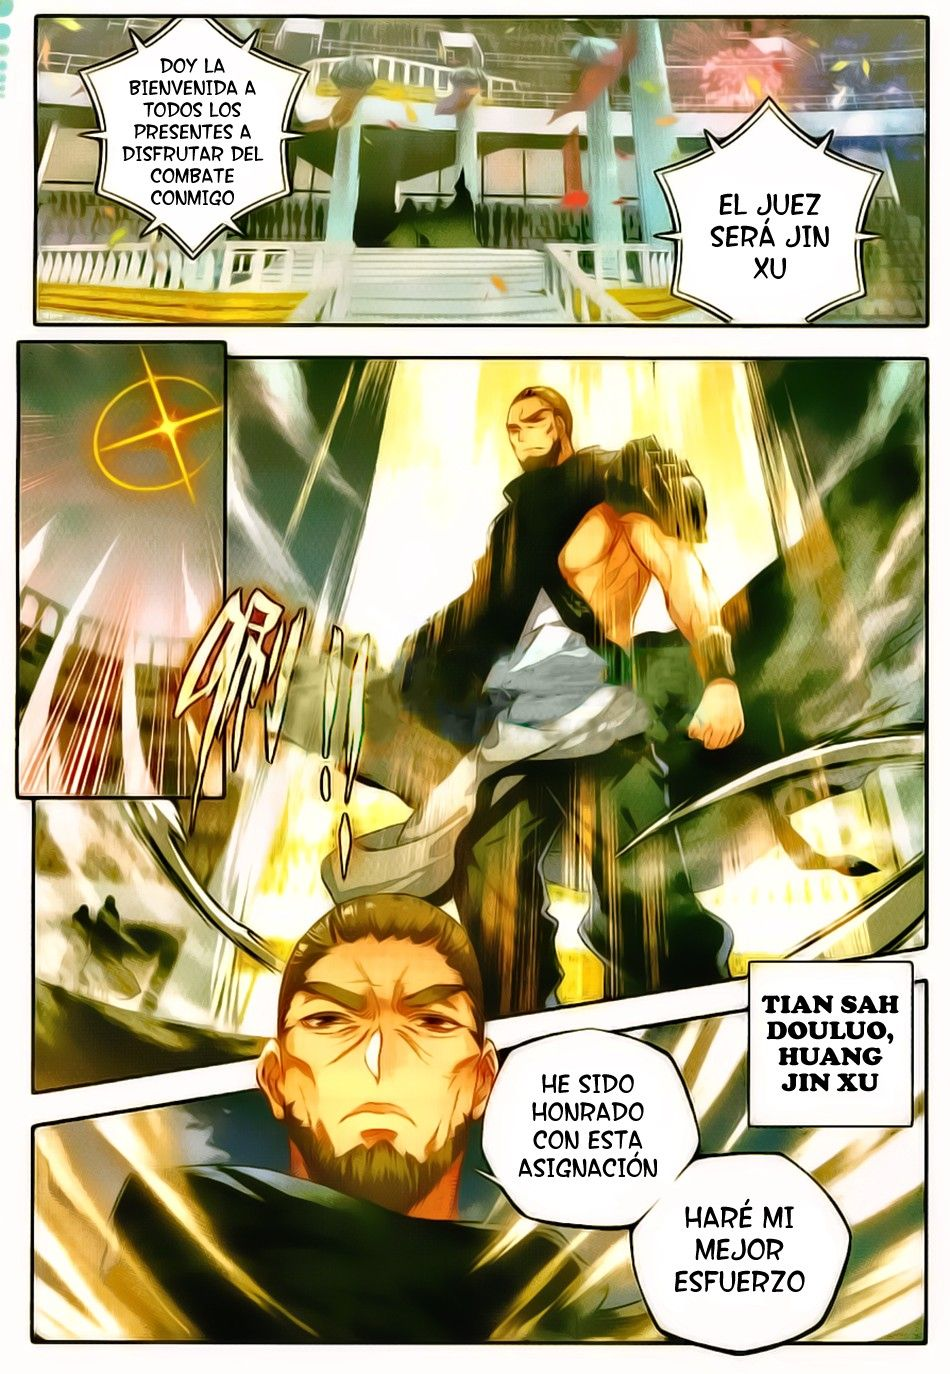 https://c5.ninemanga.com/es_manga/pic2/33/16417/514027/49dda3f3dd880fba41cb7a7d74bd08bd.jpg Page 8